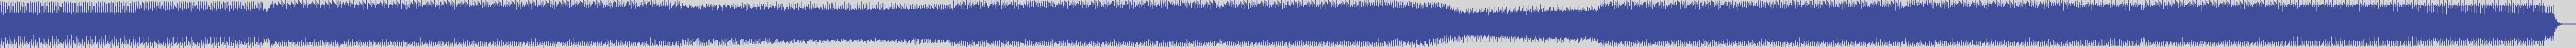 just_digital_records [JS1321] Bardini Experience - Ninetyseventyone [Club Mix] audio wave form